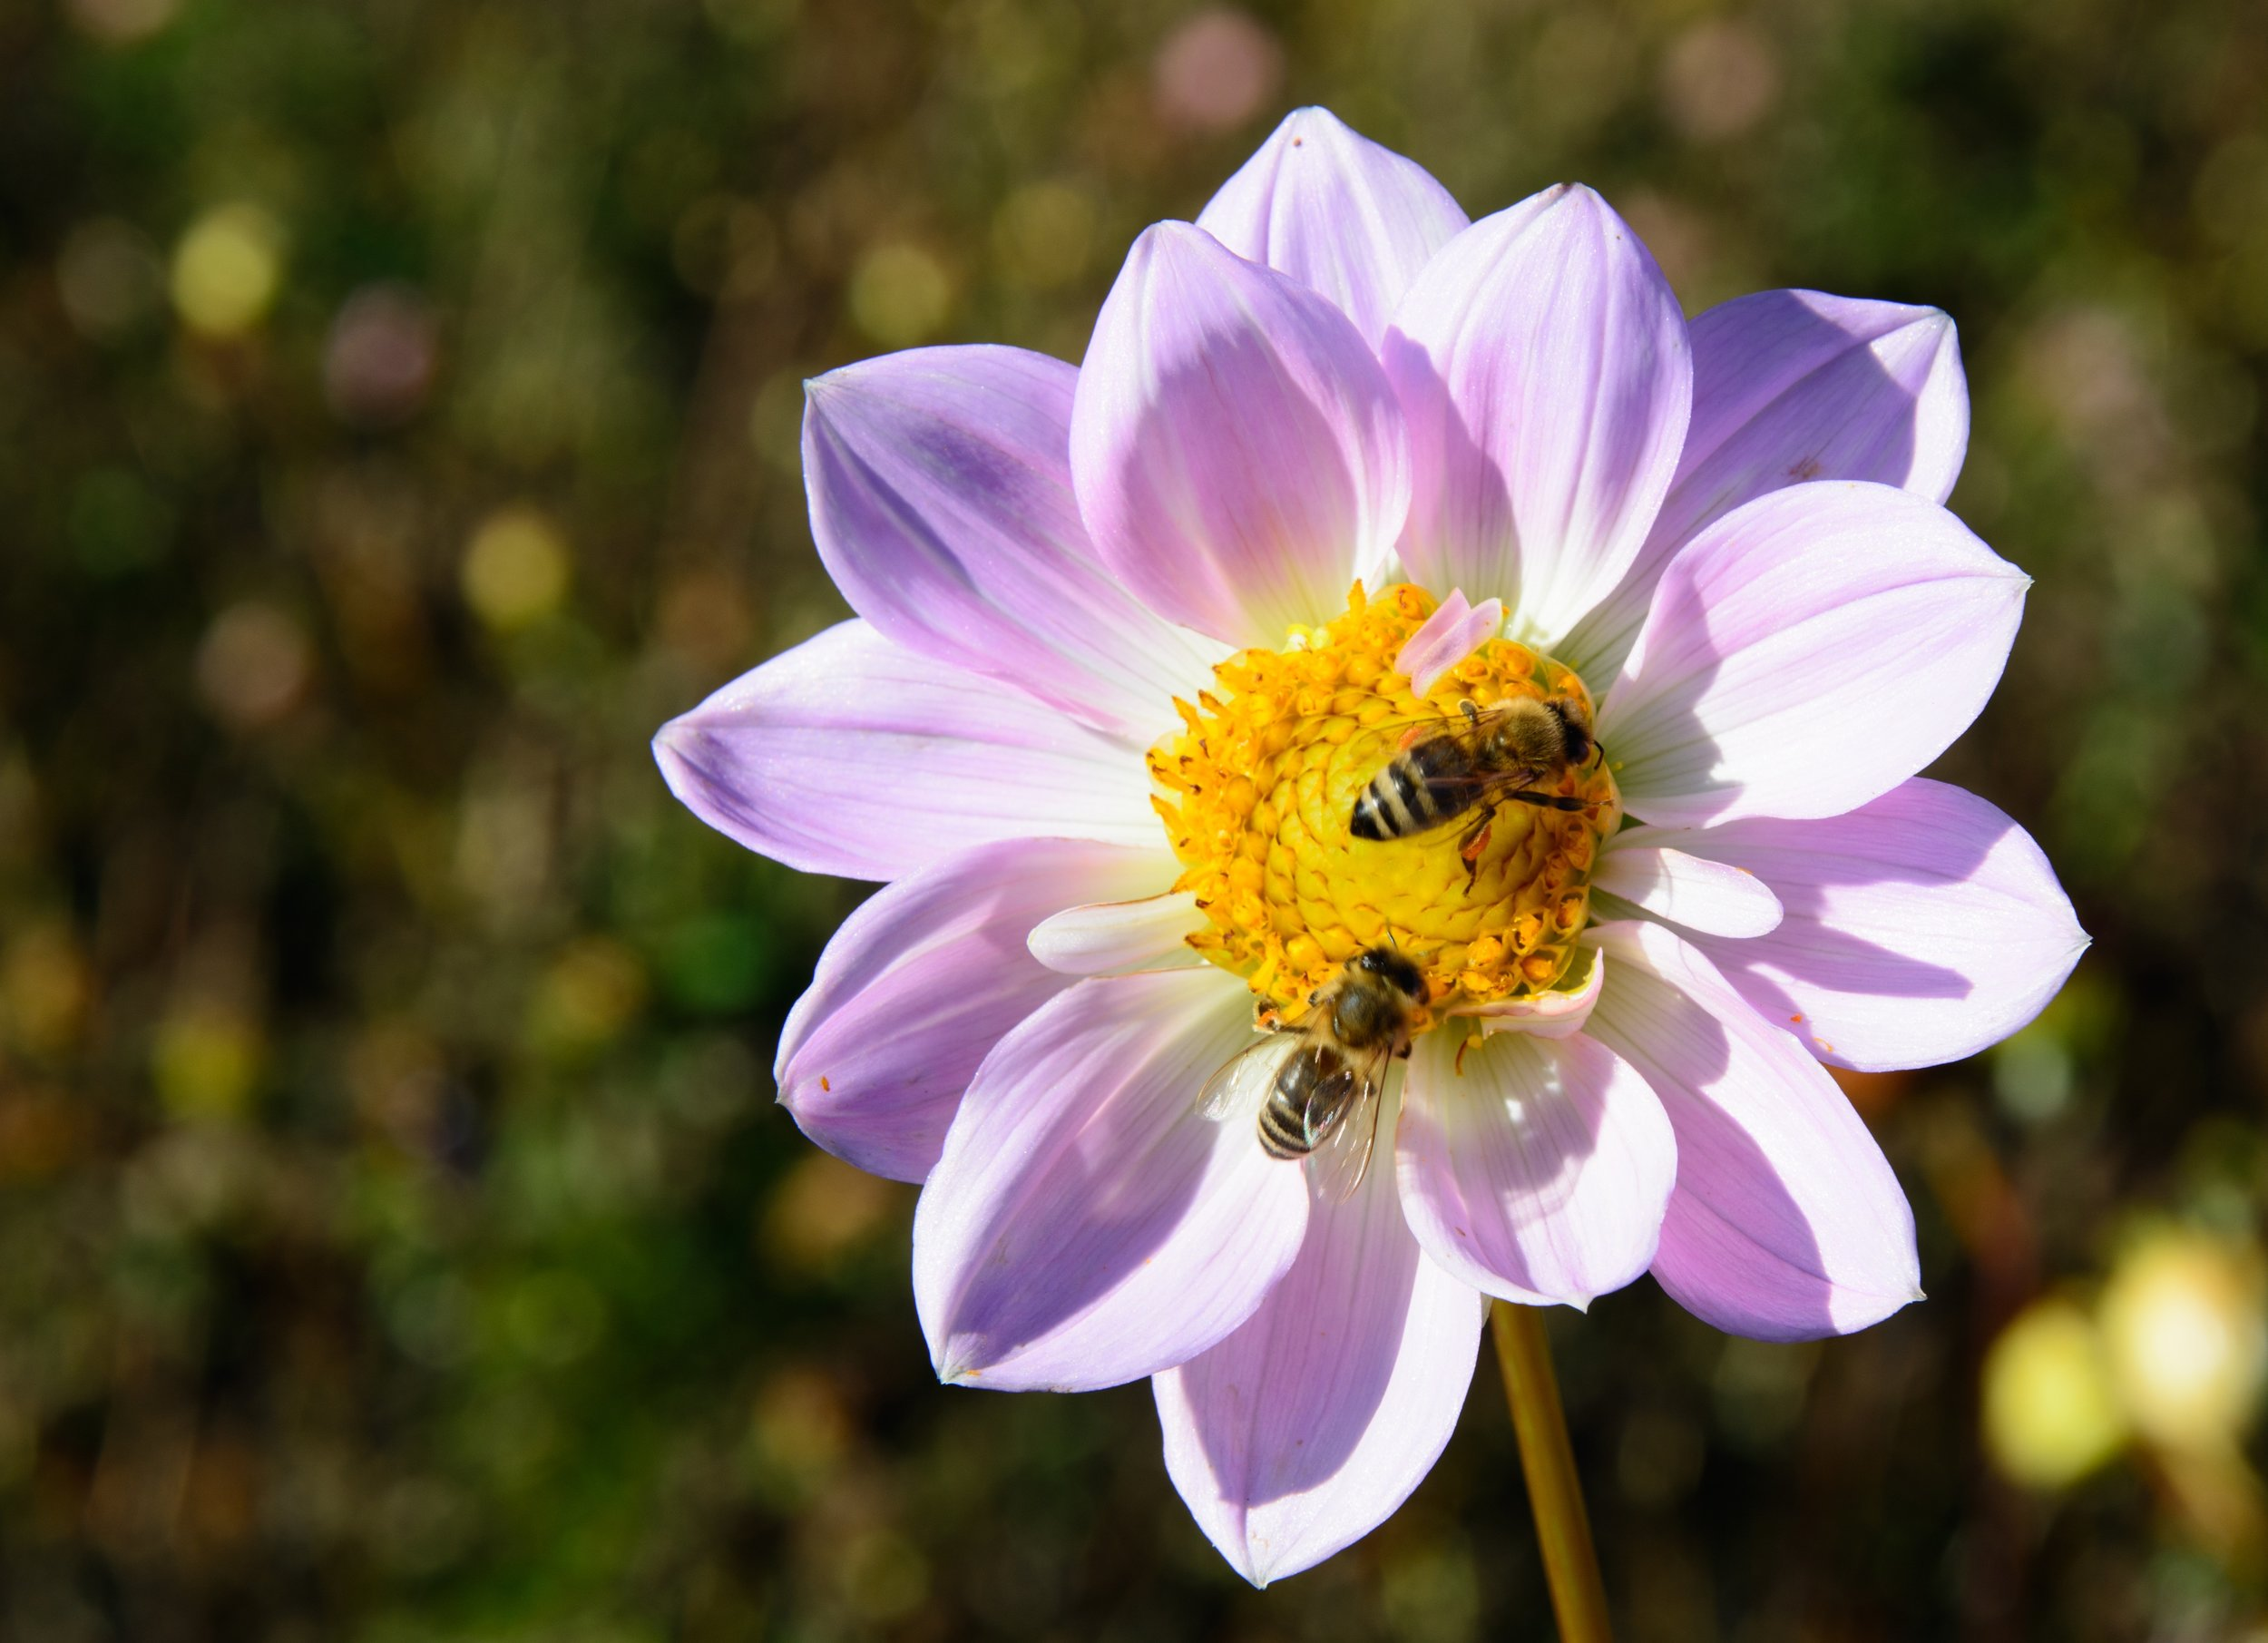 dahlia-flower-blossom-bloom-46534.jpeg